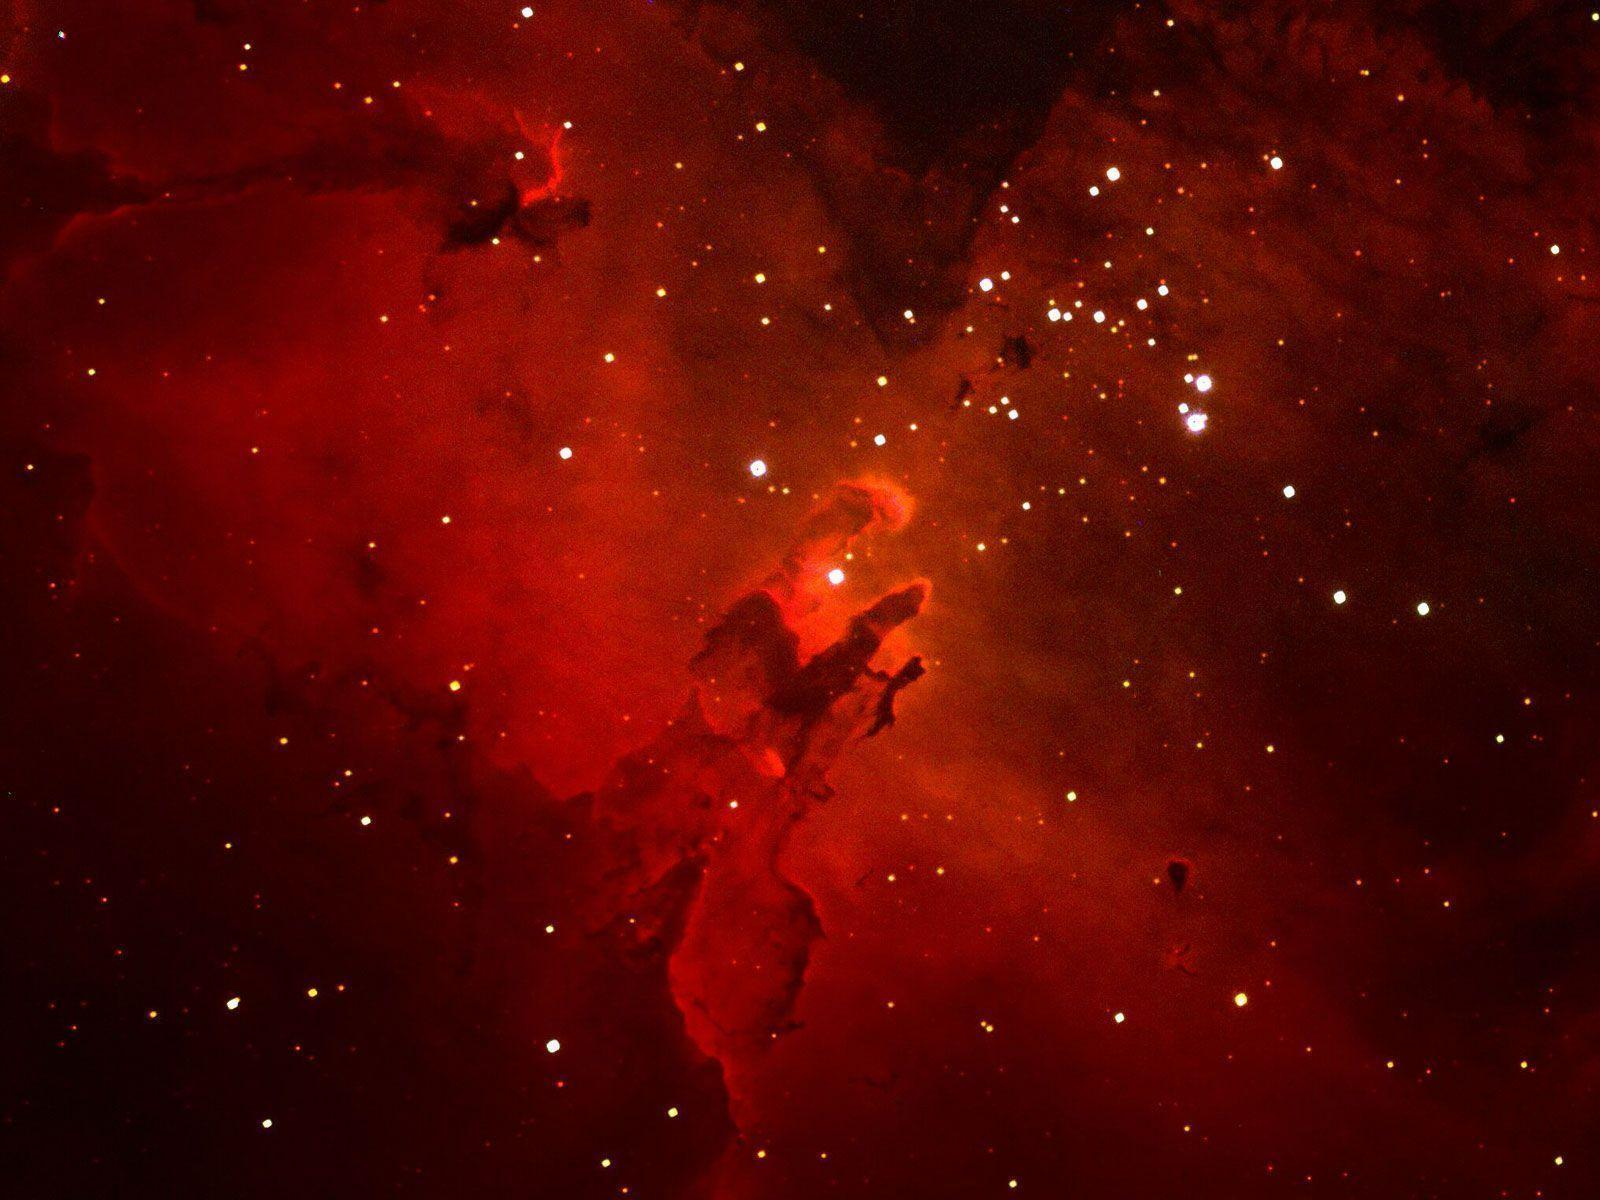 Nebula Wallpaper Widescreen Eagle Nebula Wallpaper...